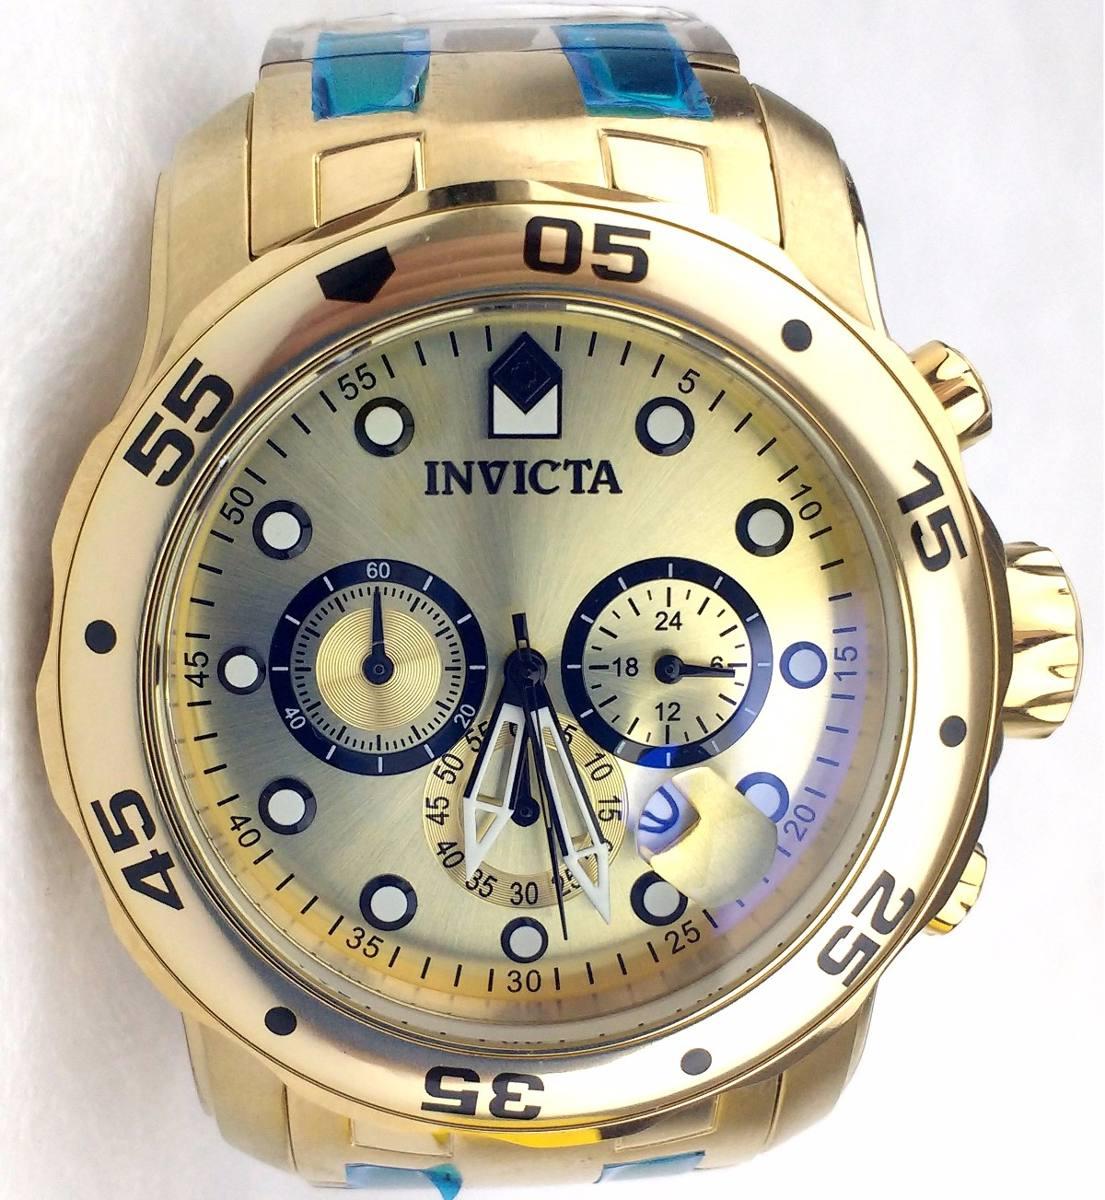 25424fb0333 relógio invicta pro diver 0074 banhado ouro 18k original. Carregando zoom.